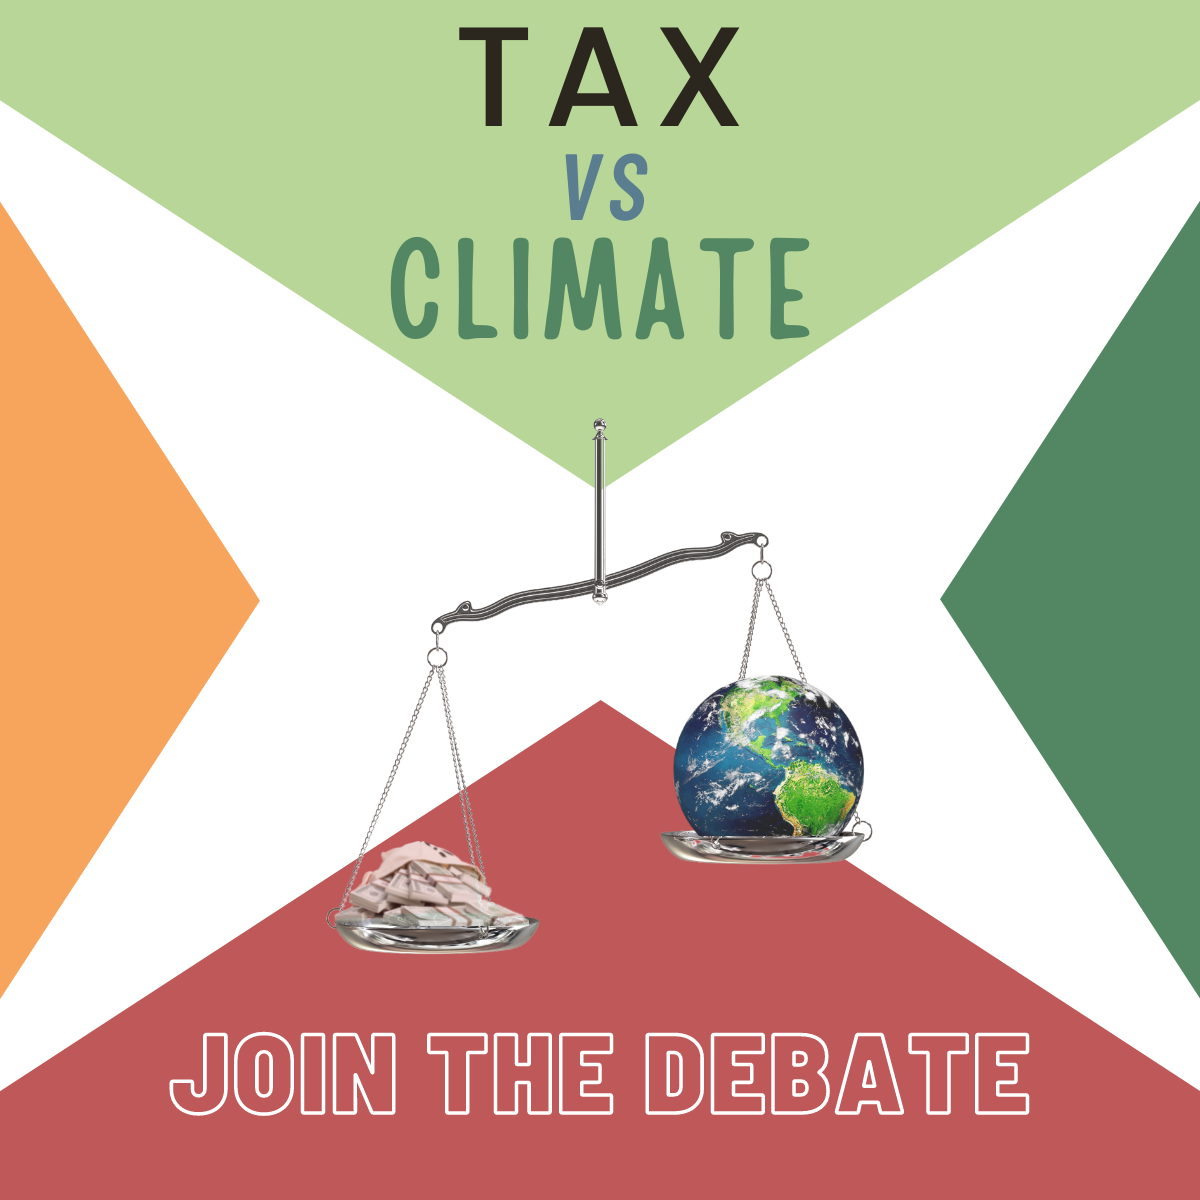 Tax vs Climate